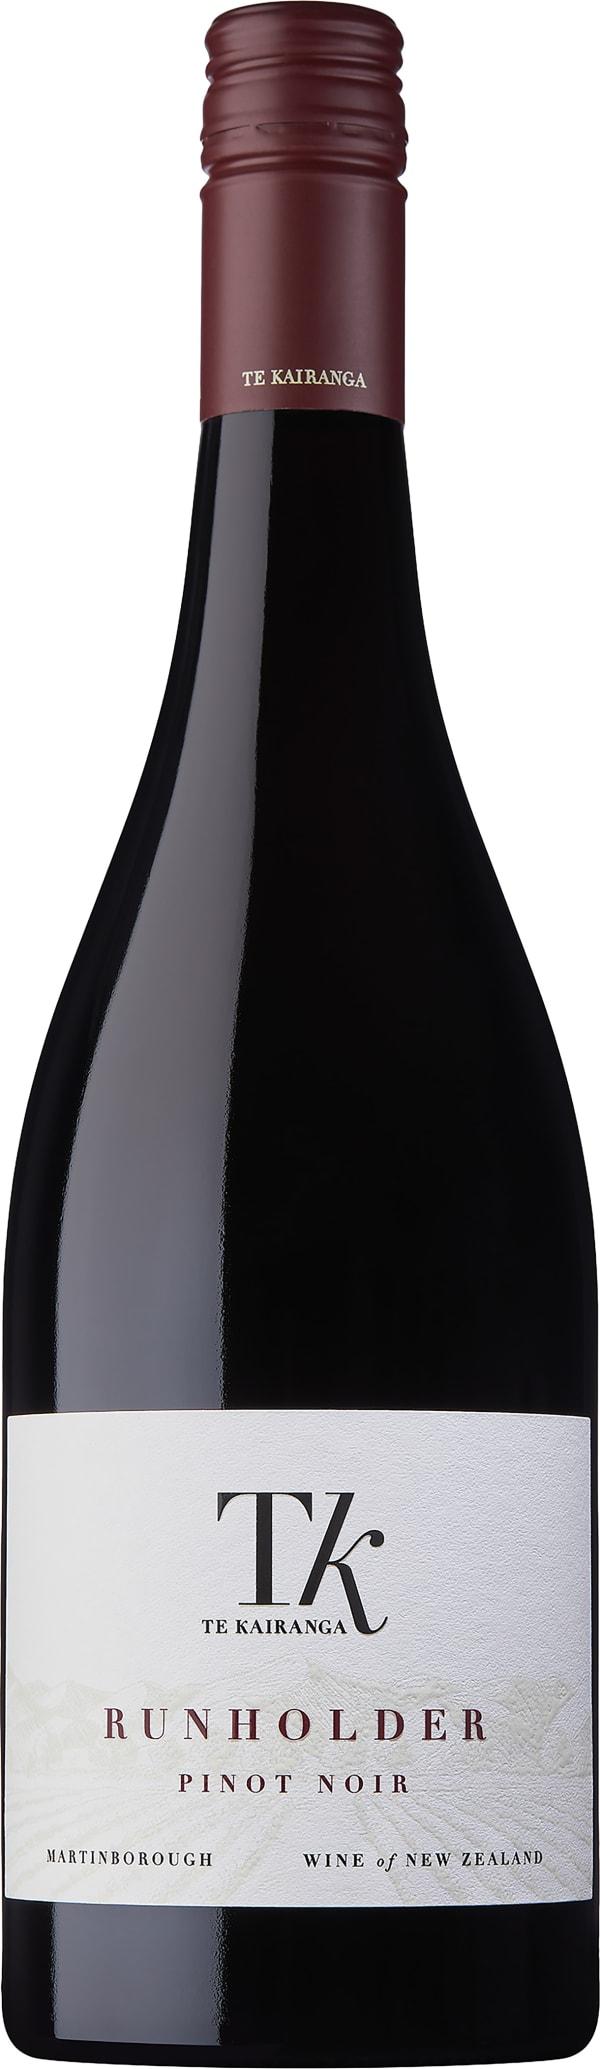 Te Kairanga Runholder Pinot Noir 2014